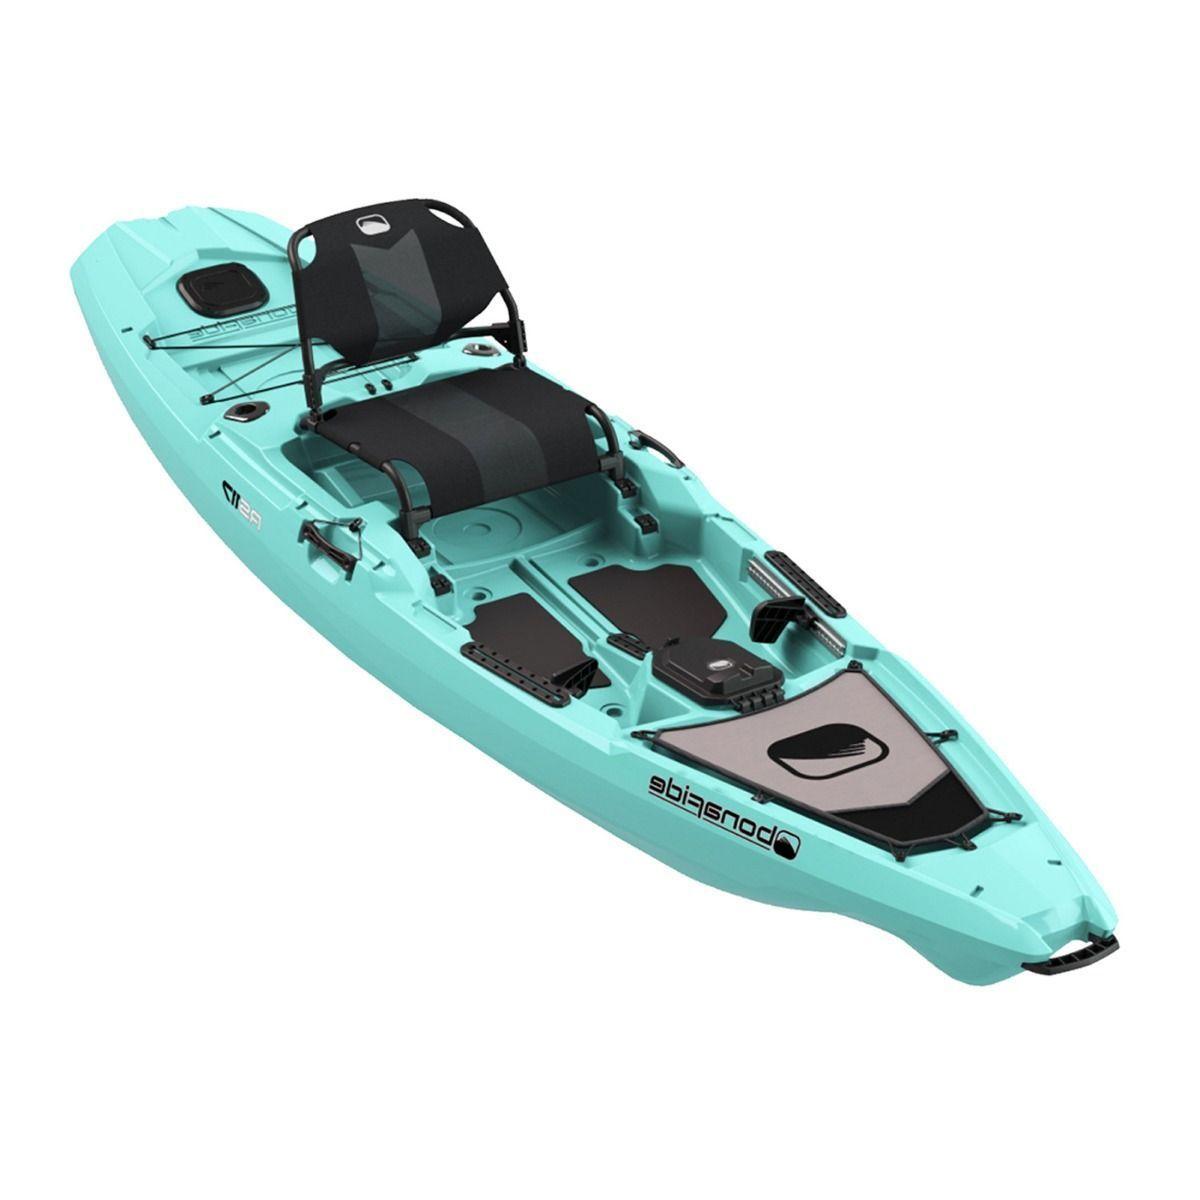 Photo of Bonafide RS117 Fishing Kayak